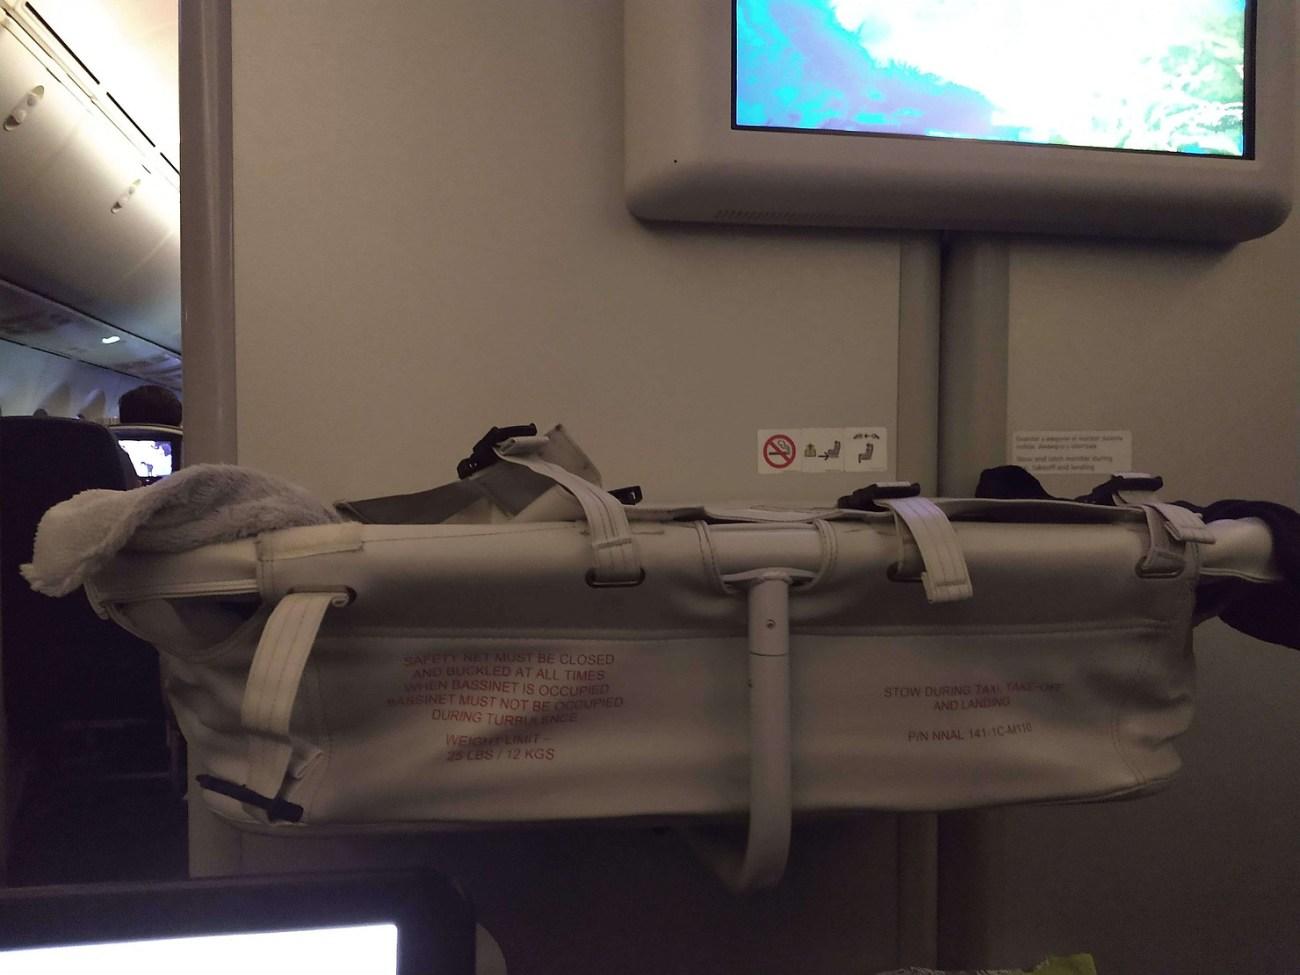 plane travel cot, bassinet